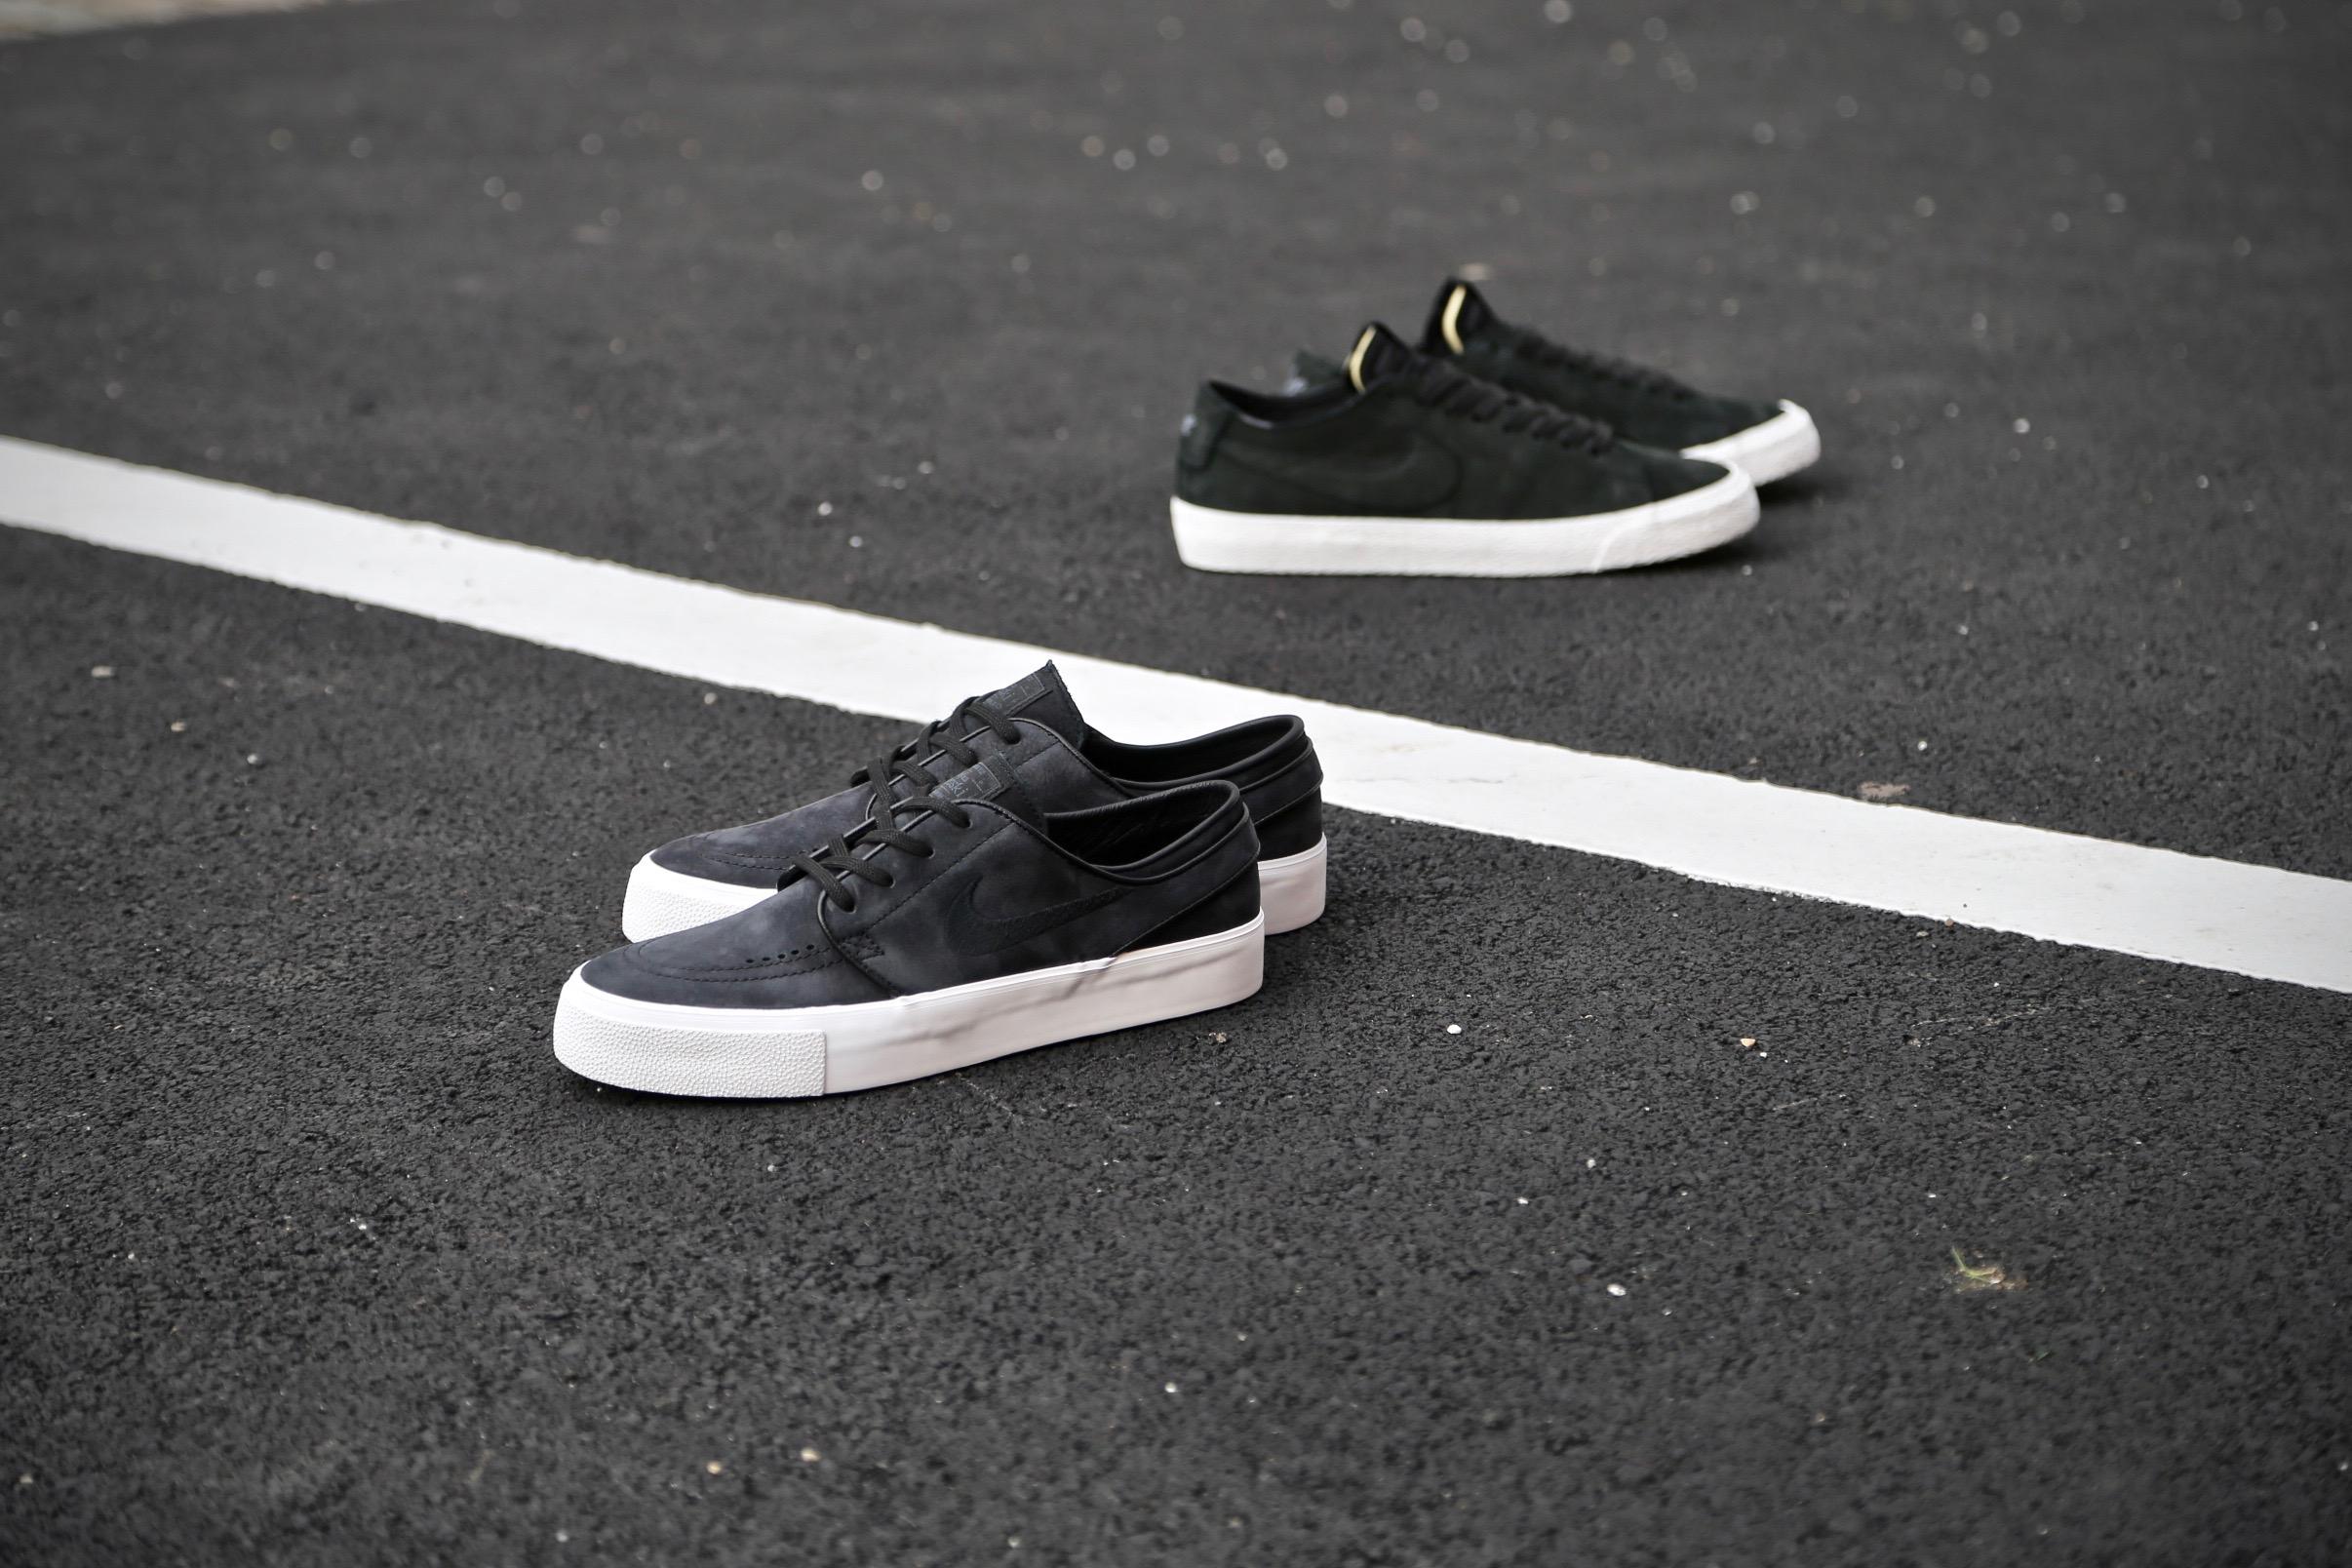 Nike SB Zoom Blazer Low Decon Black Anthracite